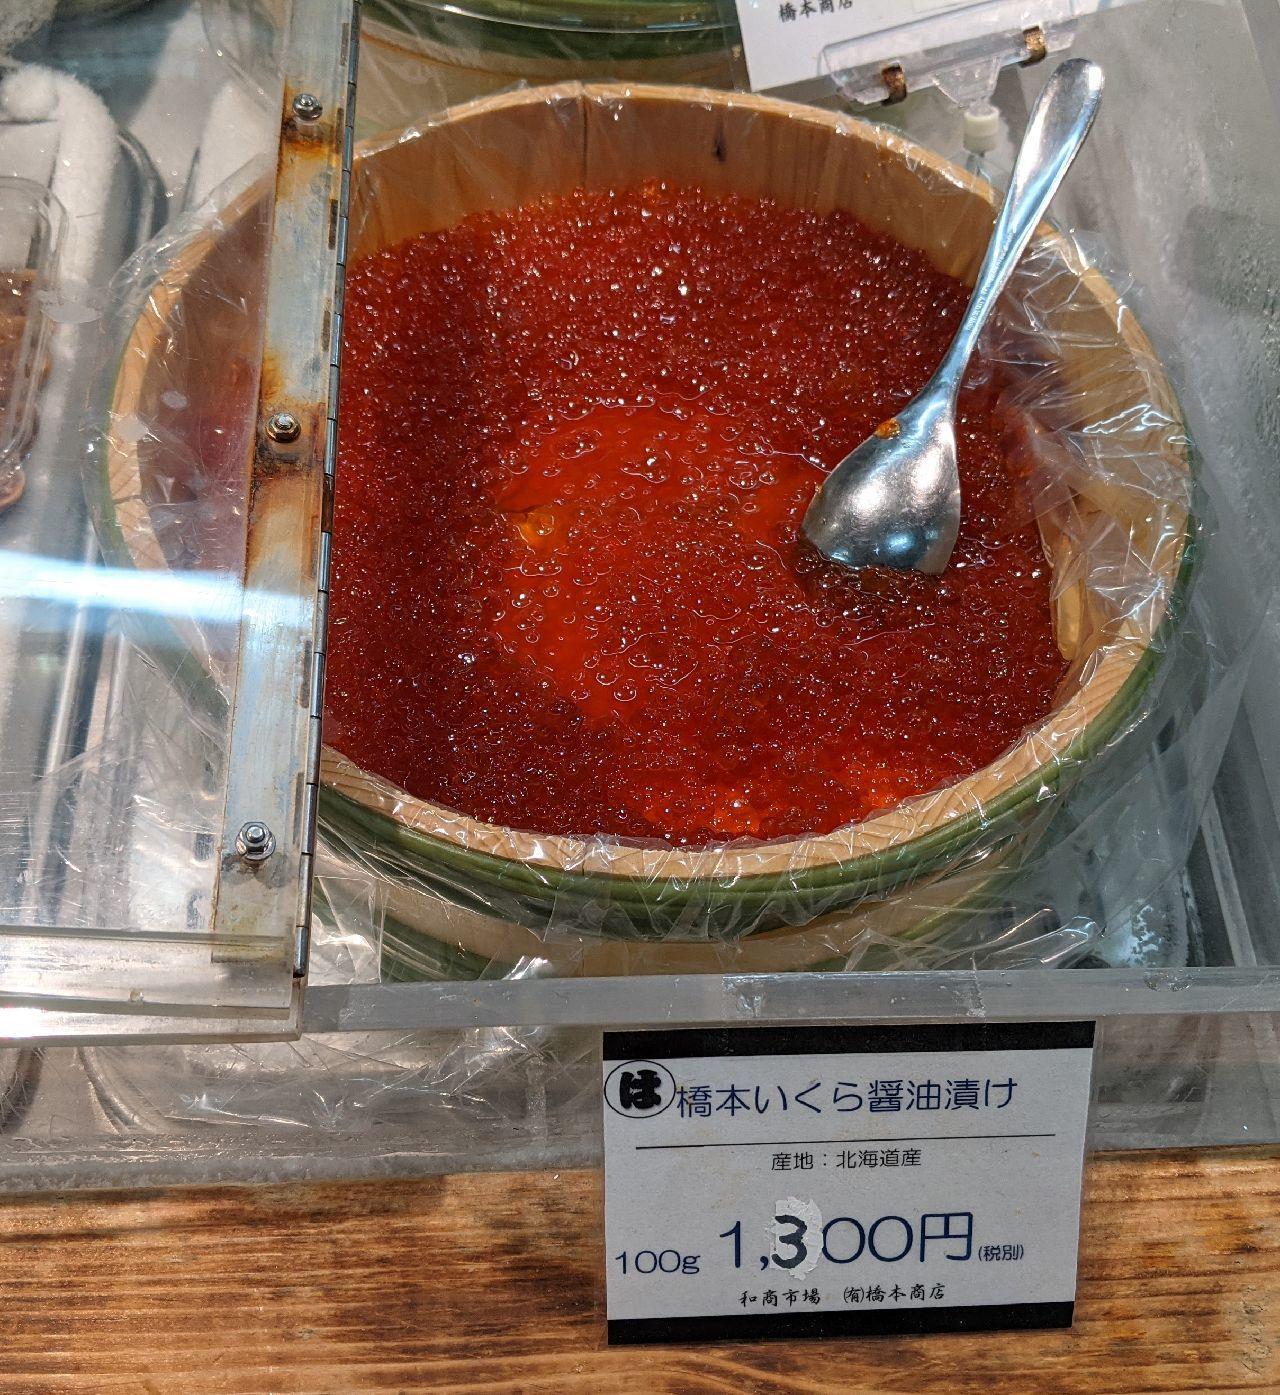 PXL_20210312_225718632橋本商店、橋本いくら醤油漬け